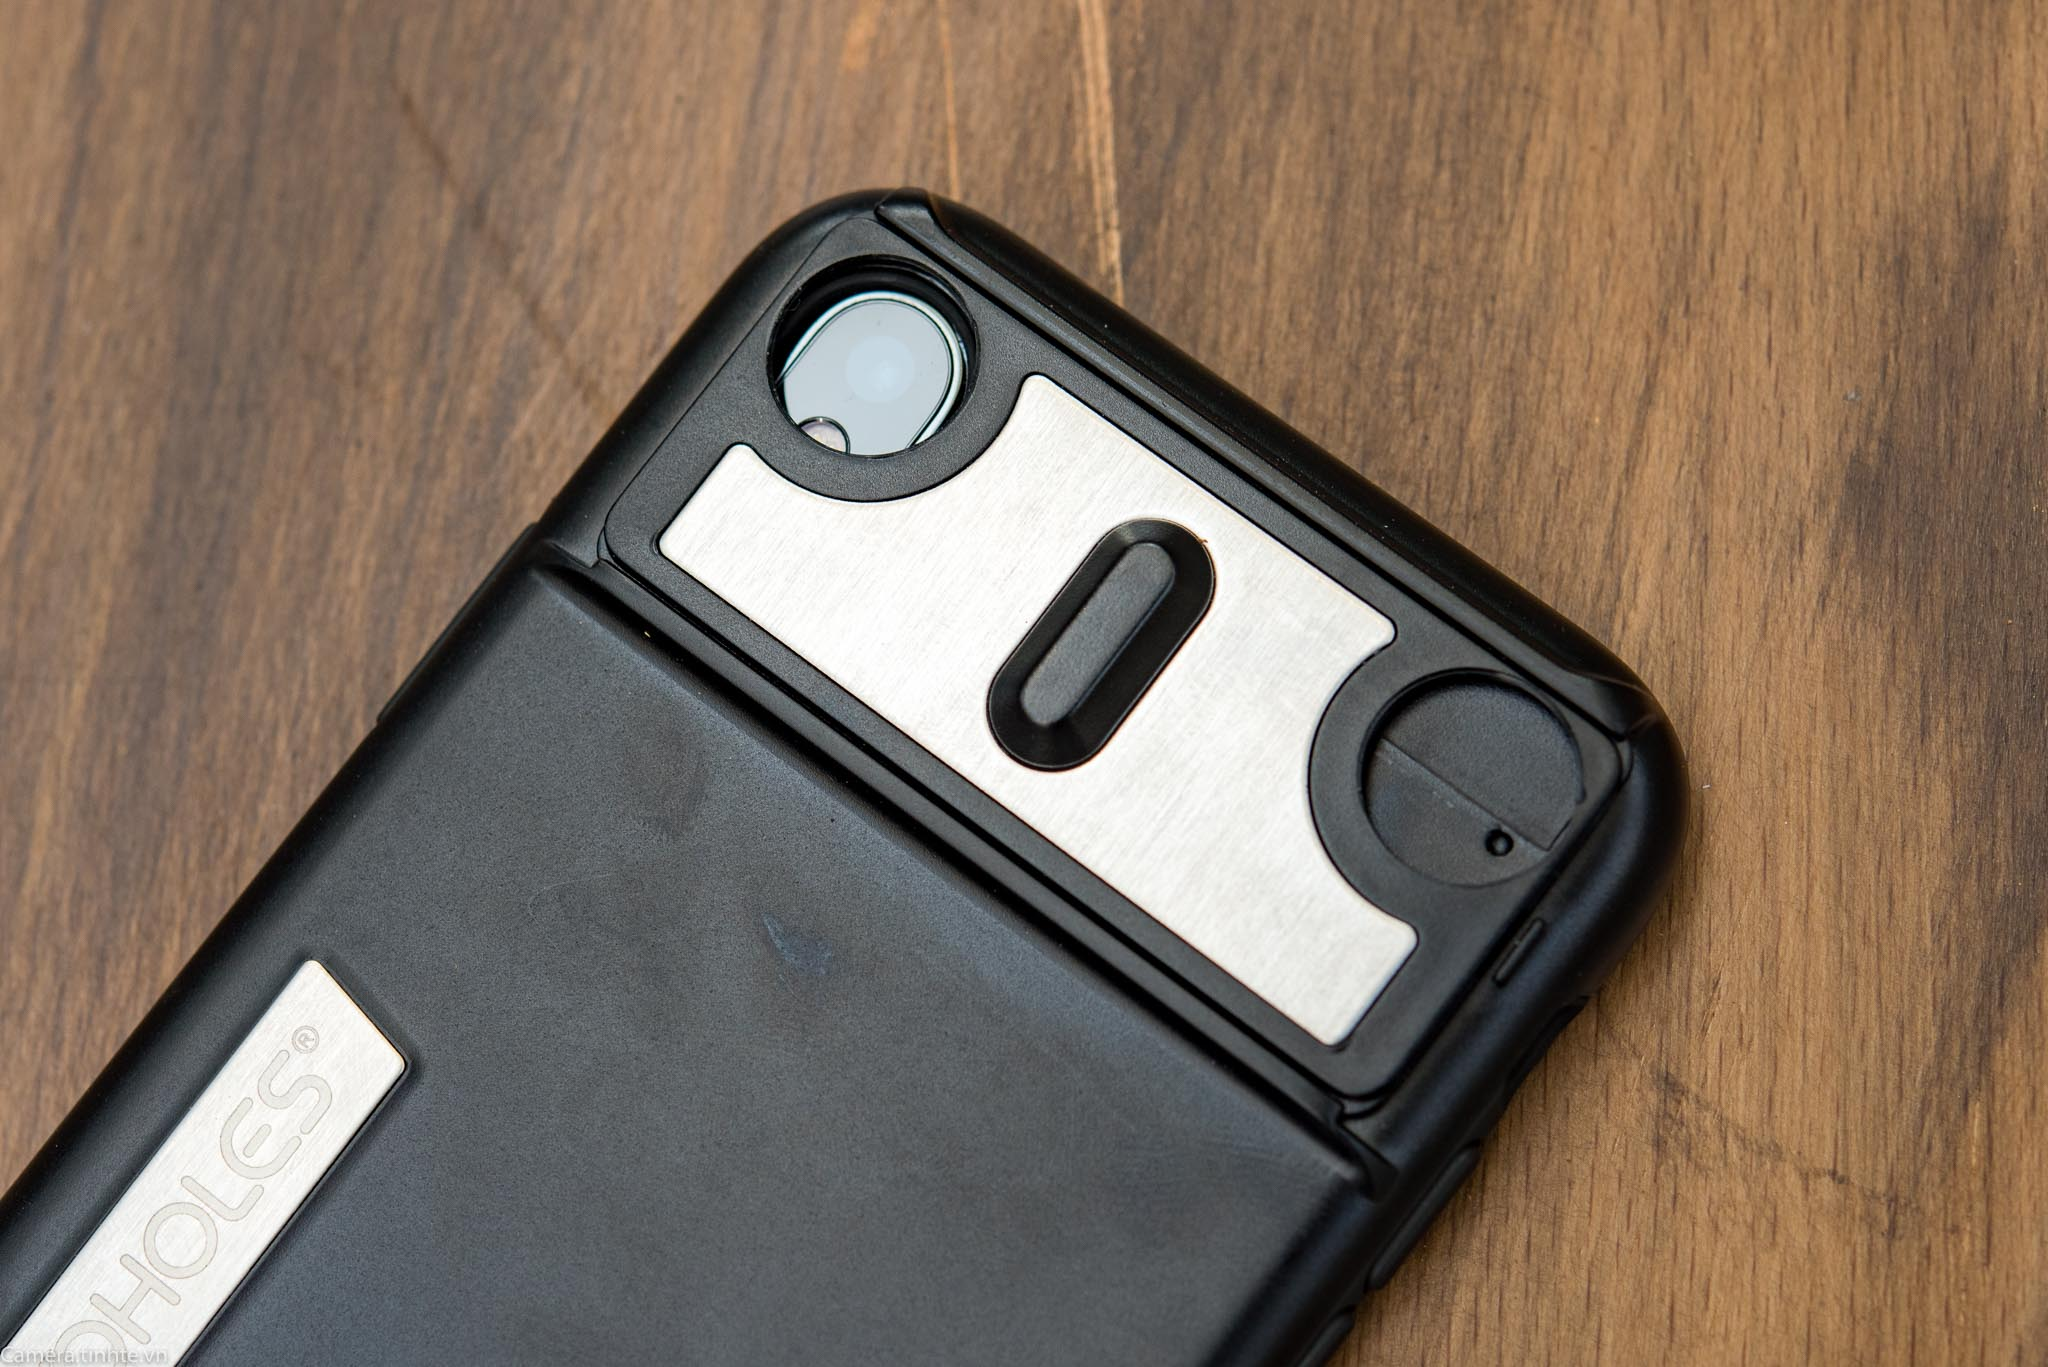 Tren tay ong kinh P-Hole lens iPhone X - Camera.tinhte.vn-10.jpg